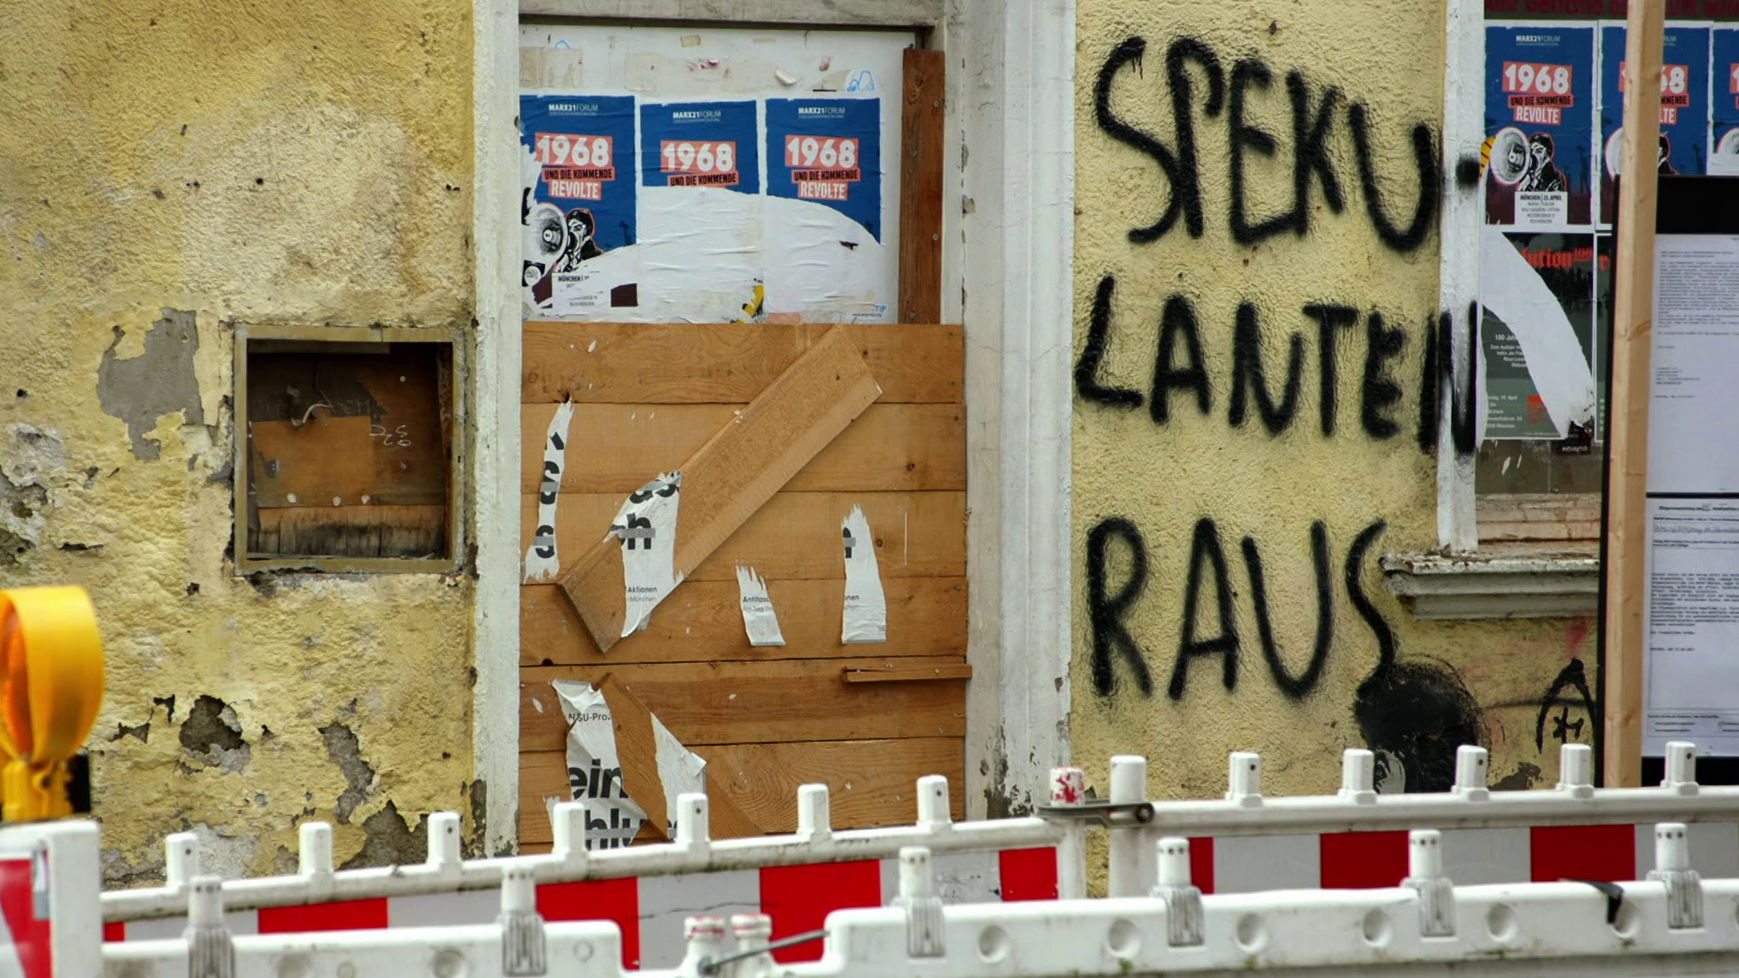 Schmiererei an Hauswand in München